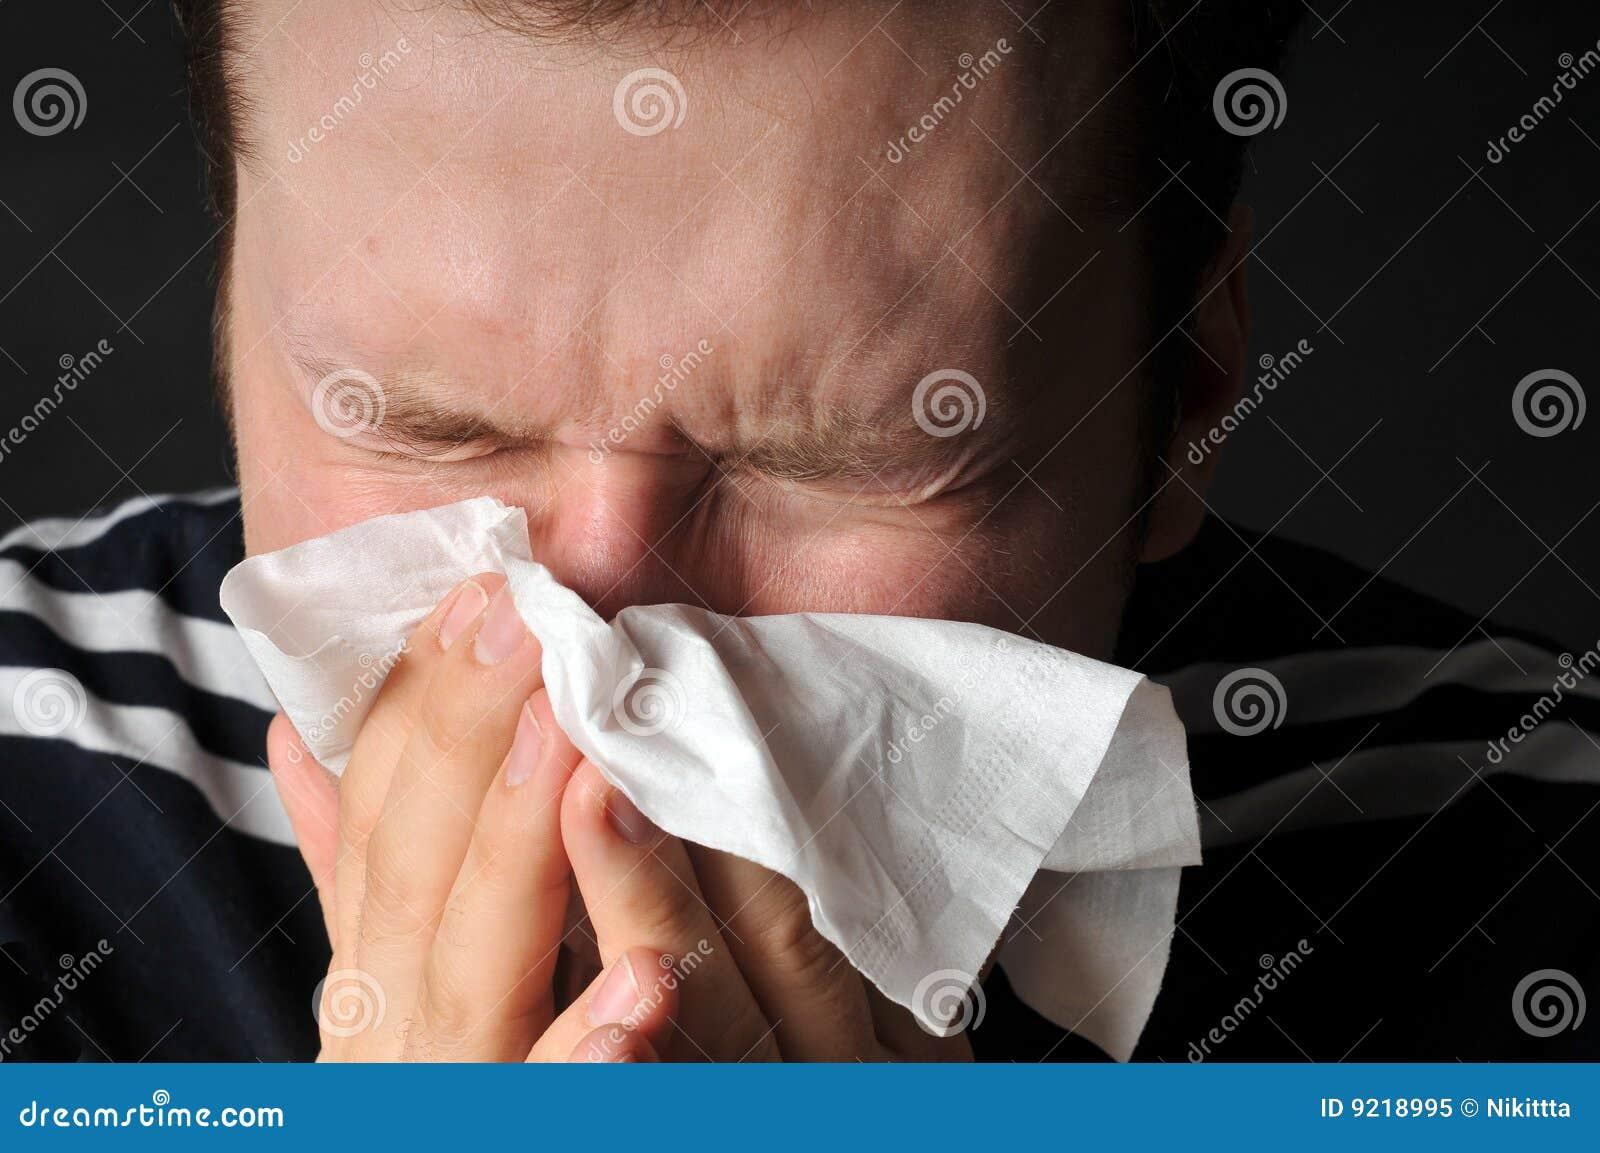 Allergicoldinfluensa